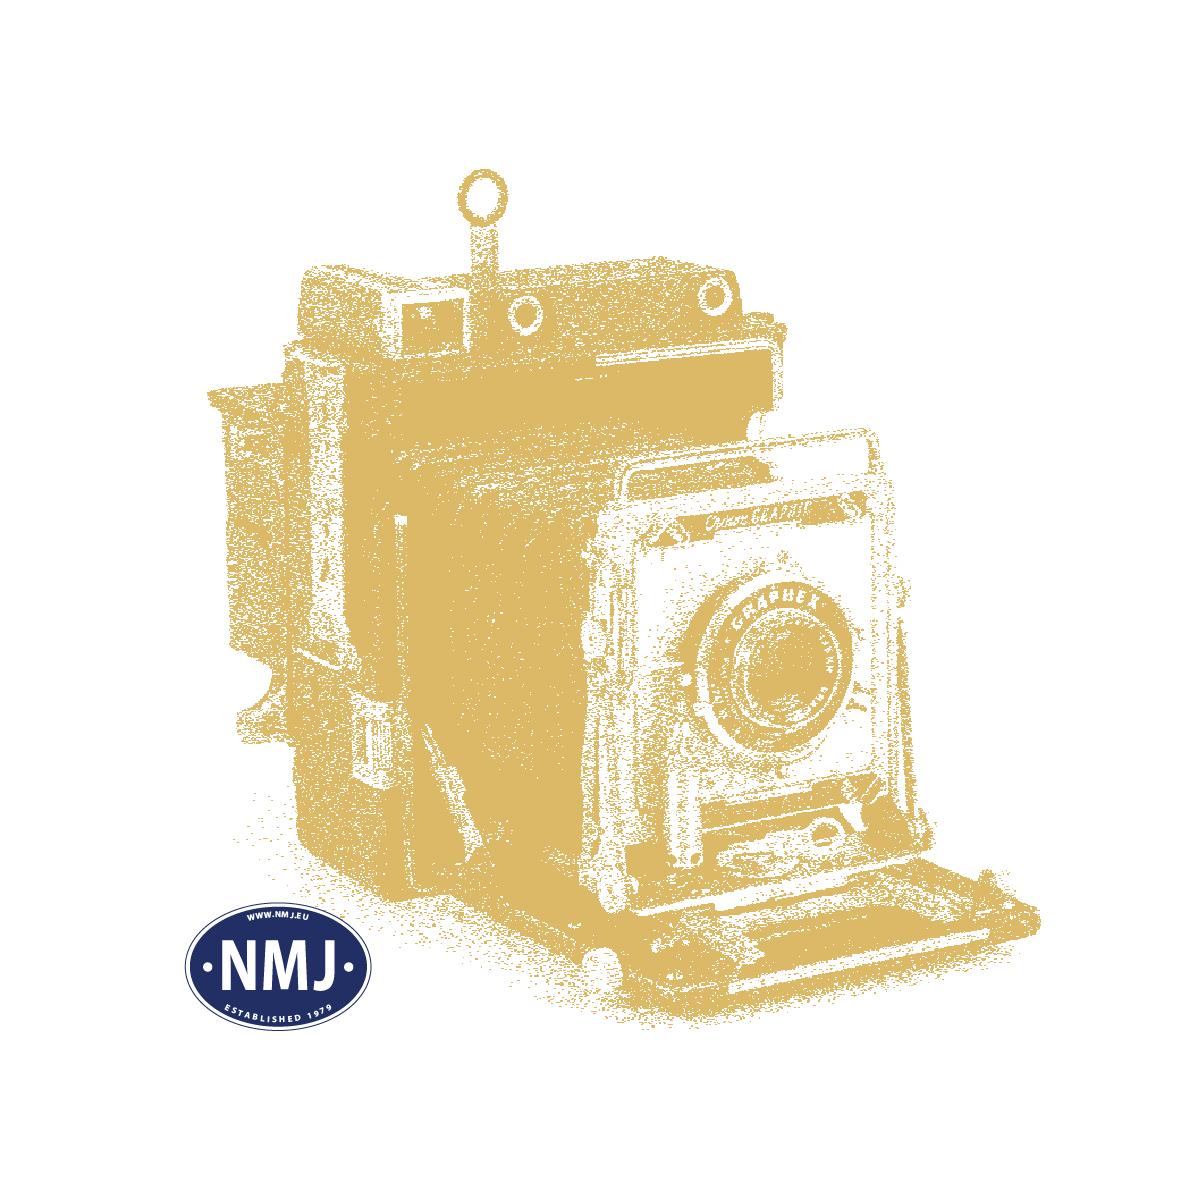 NMJ0T4-1 - NMJ Superline NSB Kbkkmp 21 76 322 0 472-8, 0-Scale